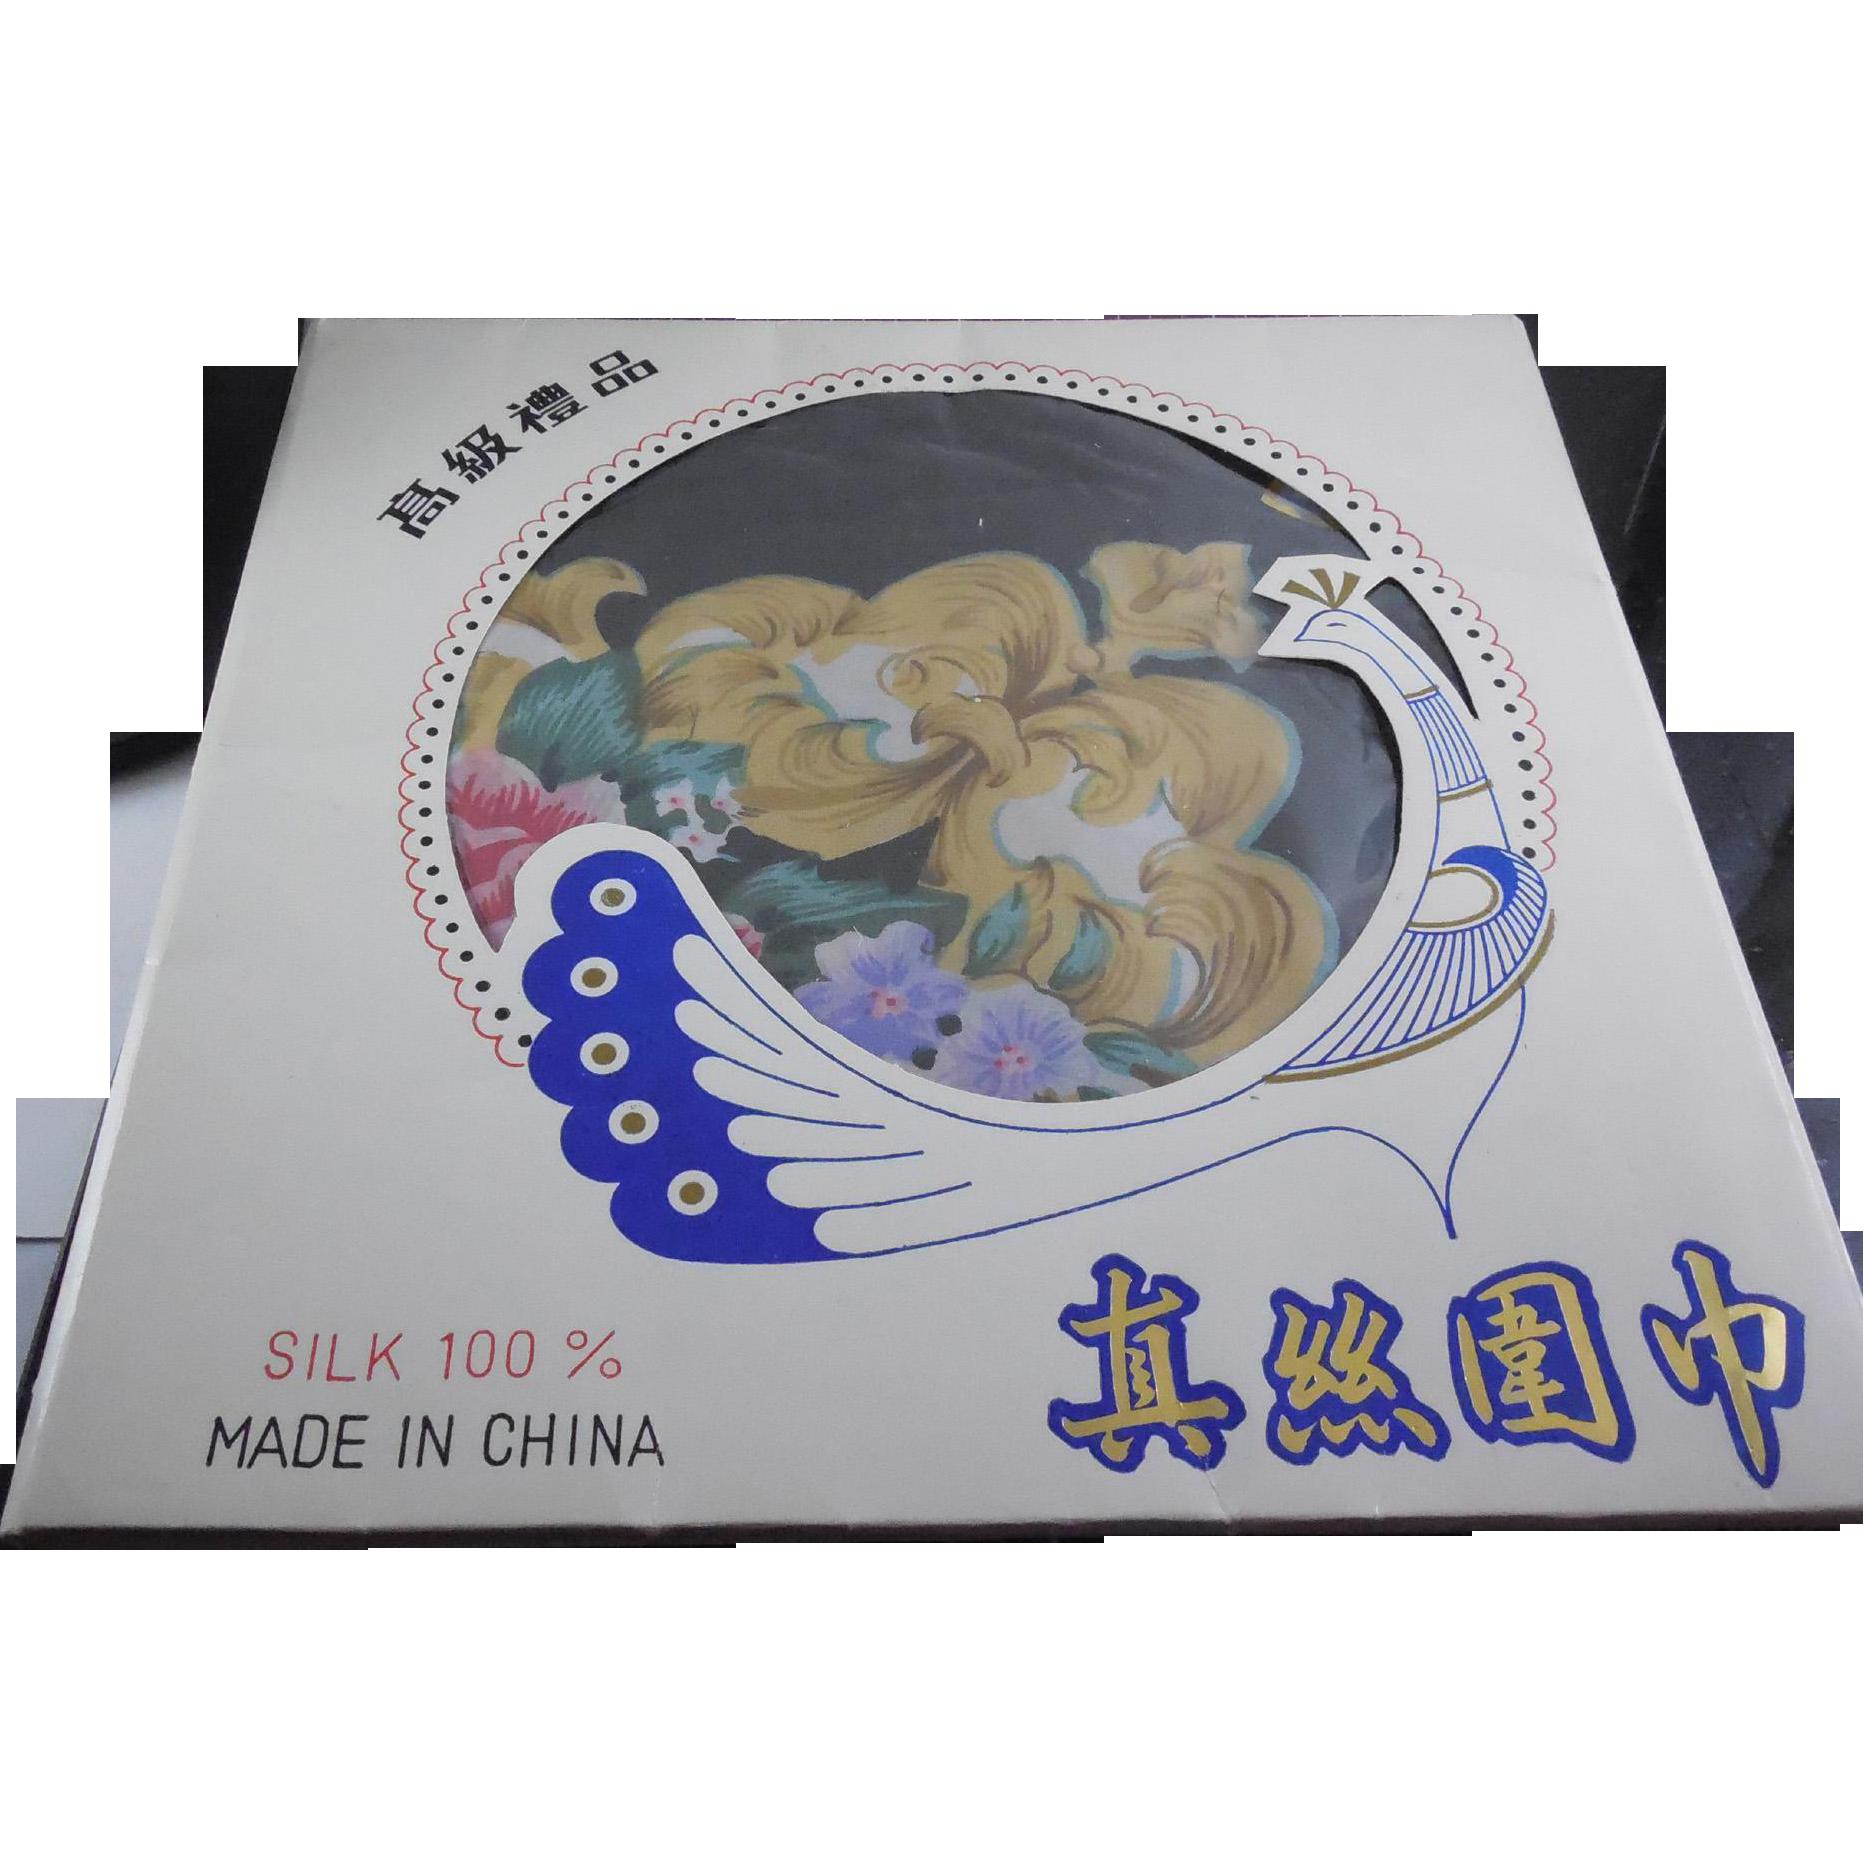 Vintage NOS 100% Chinese Silk Scarf In Original Package - Peony Flowers